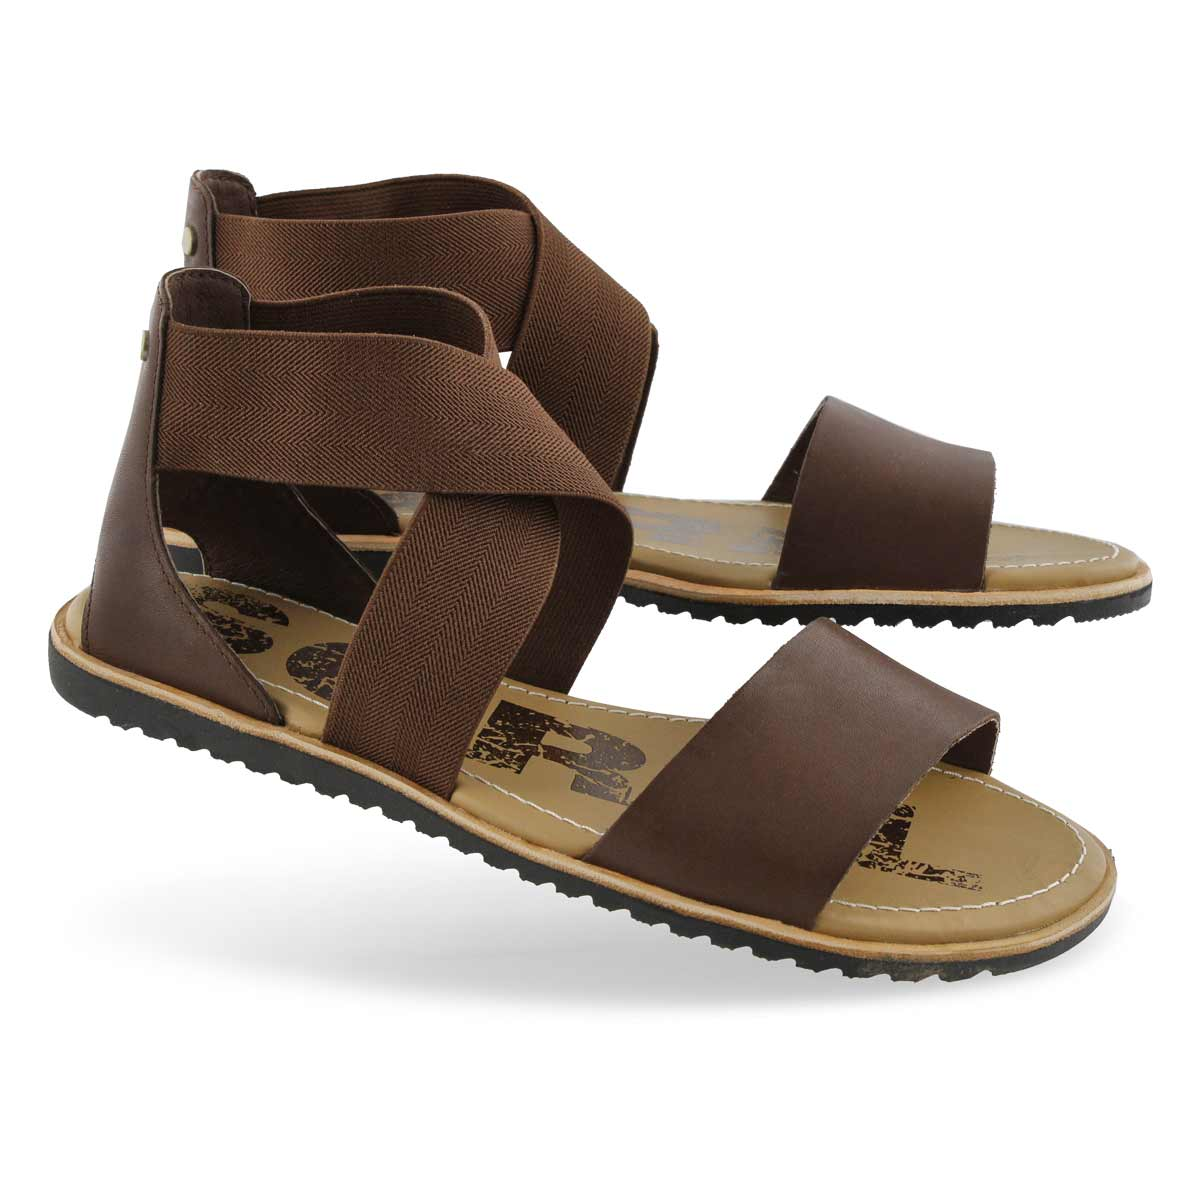 Lds Ella tobacco casual sandal